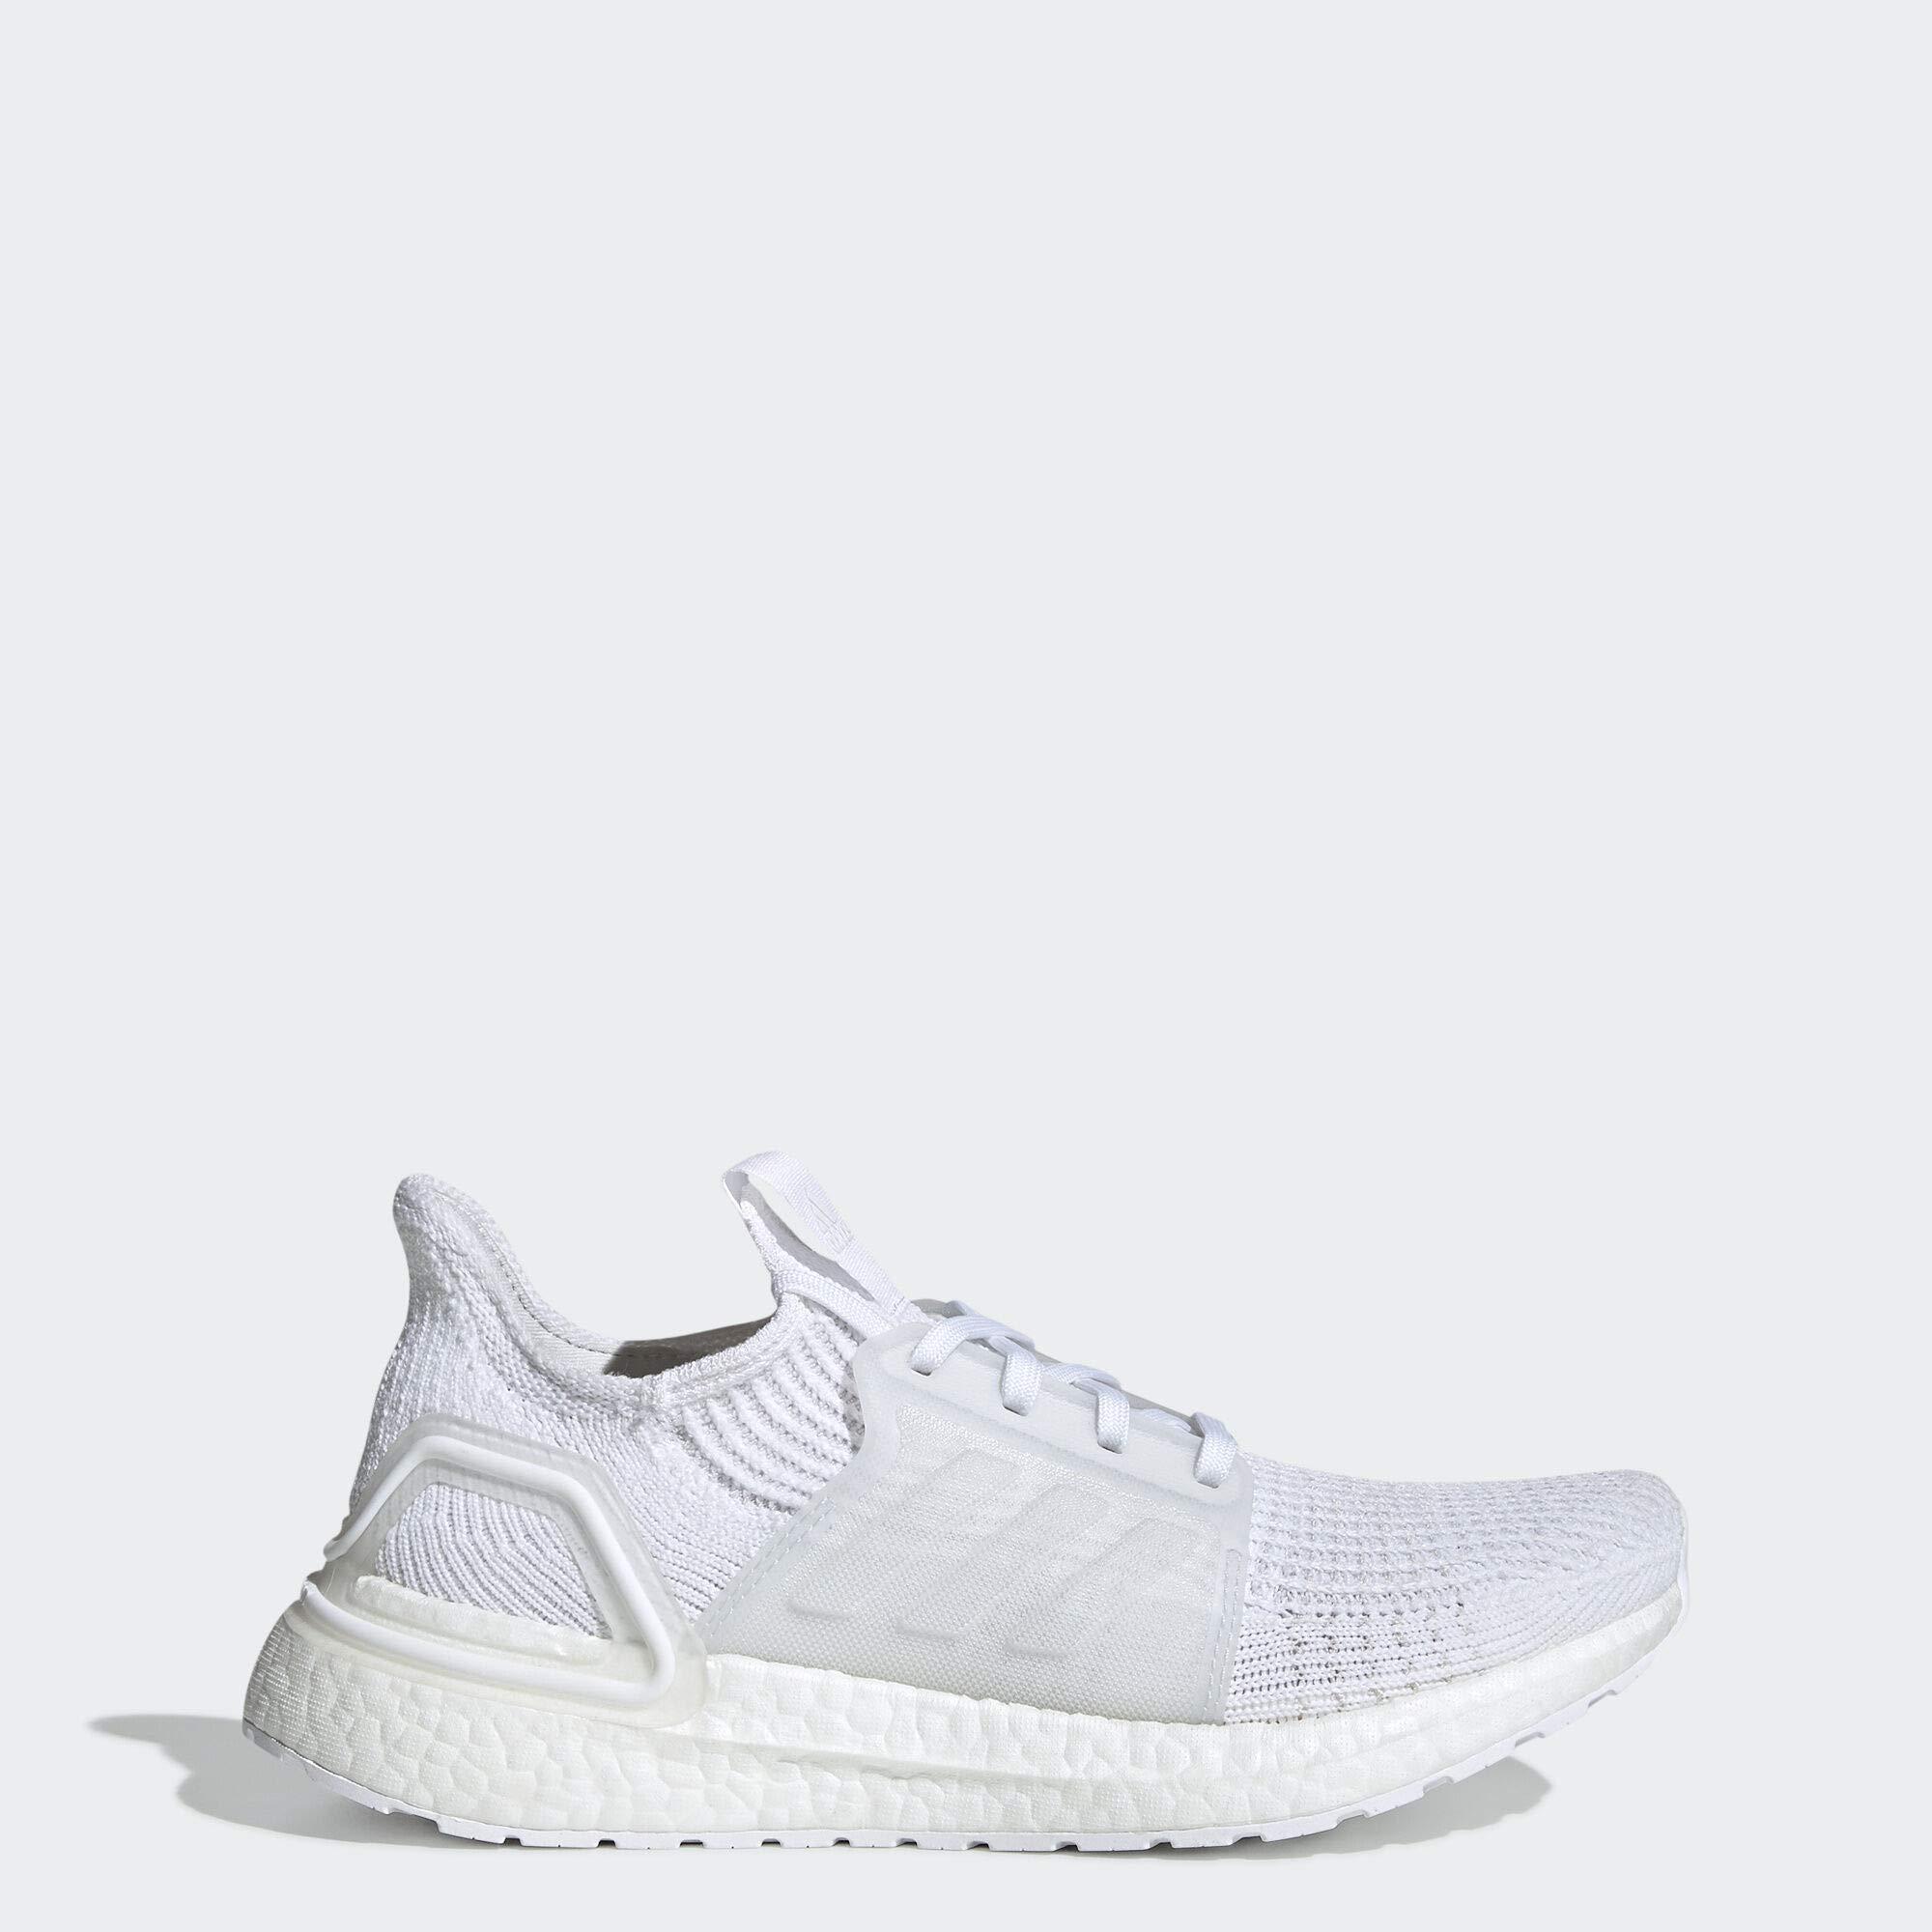 adidas Women's Ultraboost 19 Running Shoe, White/Grey/Black, 10 M US by adidas